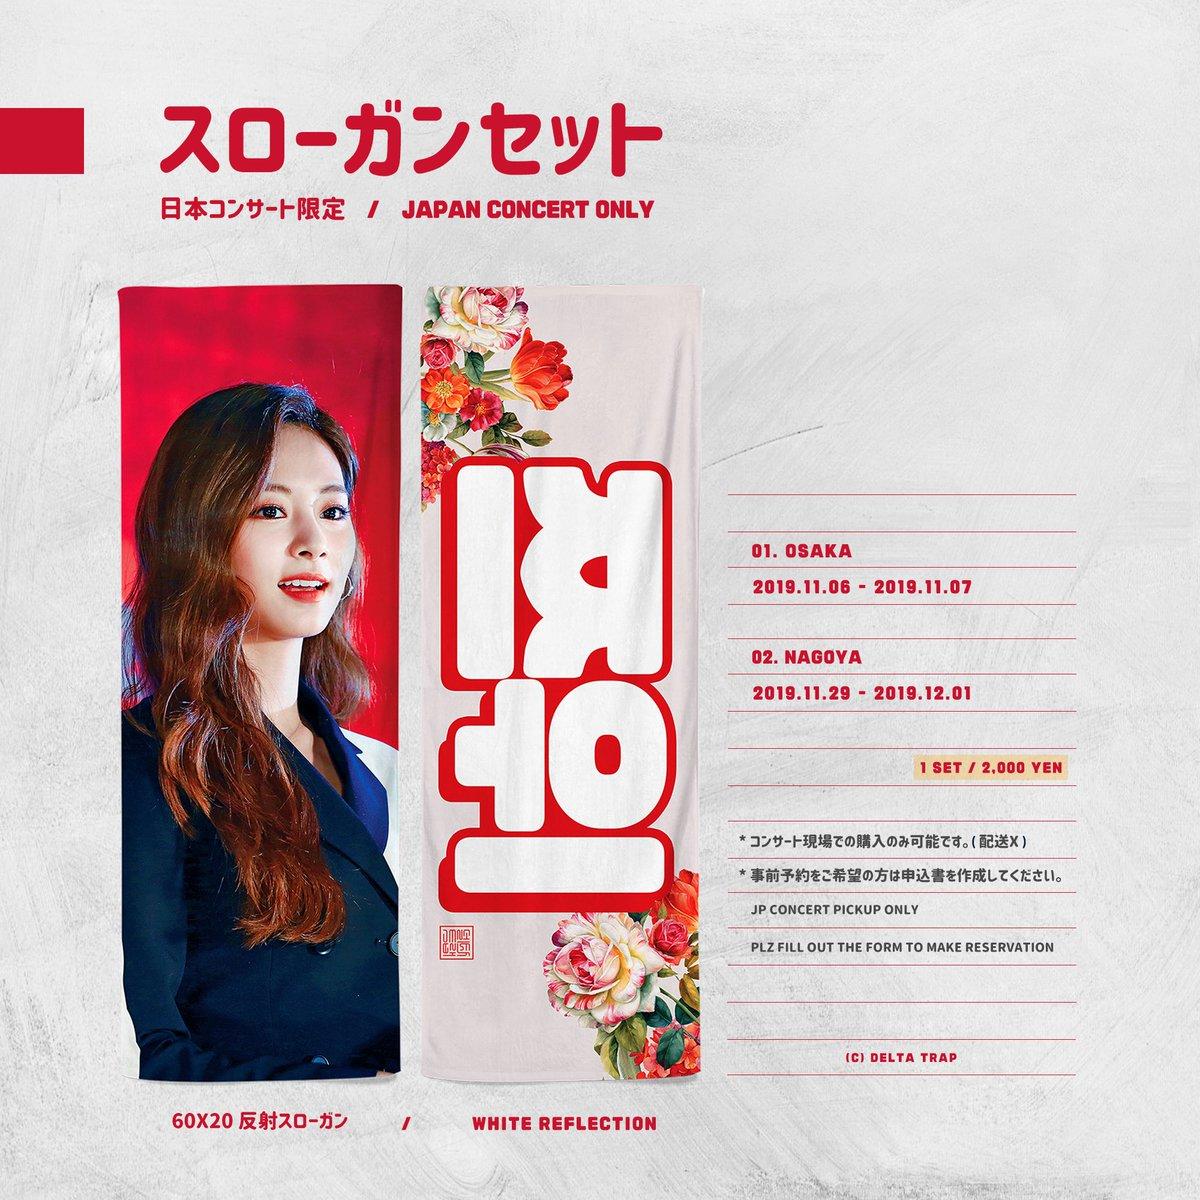 [🇲🇾MY GO] ORDER LINK:  https://docs.google.com/forms/d/e/1FAIpQLScUrhhmcTnaRV0RM8O78w37-EDkPmk6yOWDR3joBdMzwGET3Q/viewform…  Deadline 30 NOV @delta_trap Japan Tour Slogan  EACH SET  MEET UP 105 WM 110 EM 115  ALL INCLUDED POSTAGE & TAX NO 2ND PAYMENT NEEDED